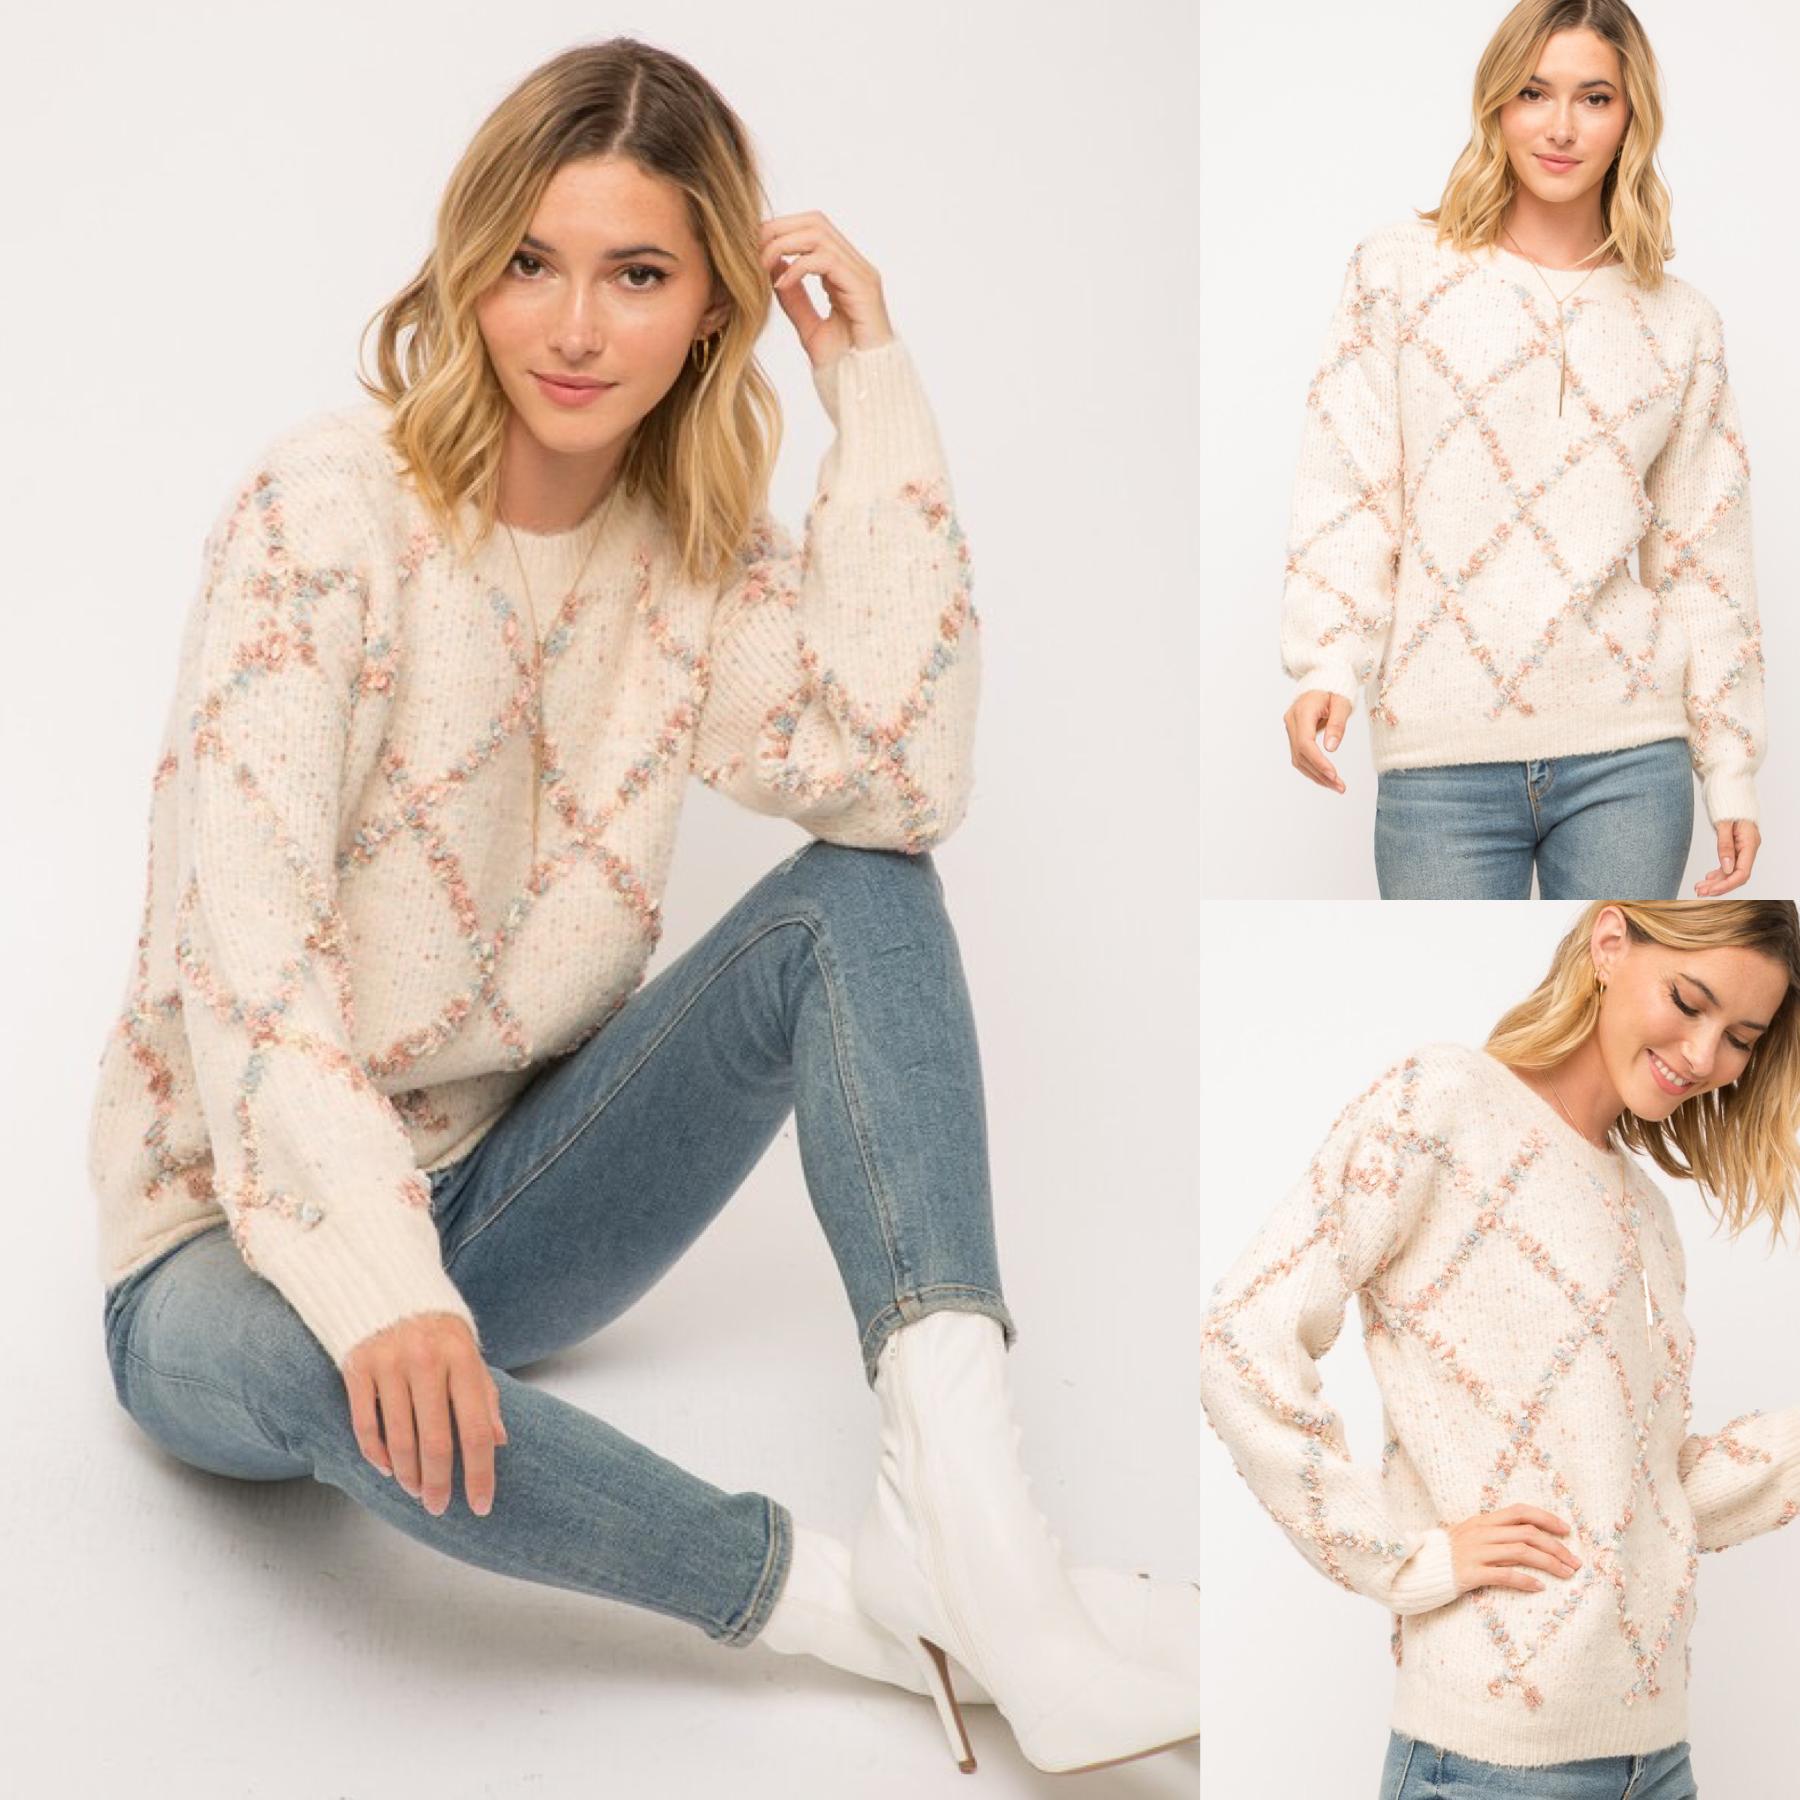 Popcorn Texture Knit Sweater